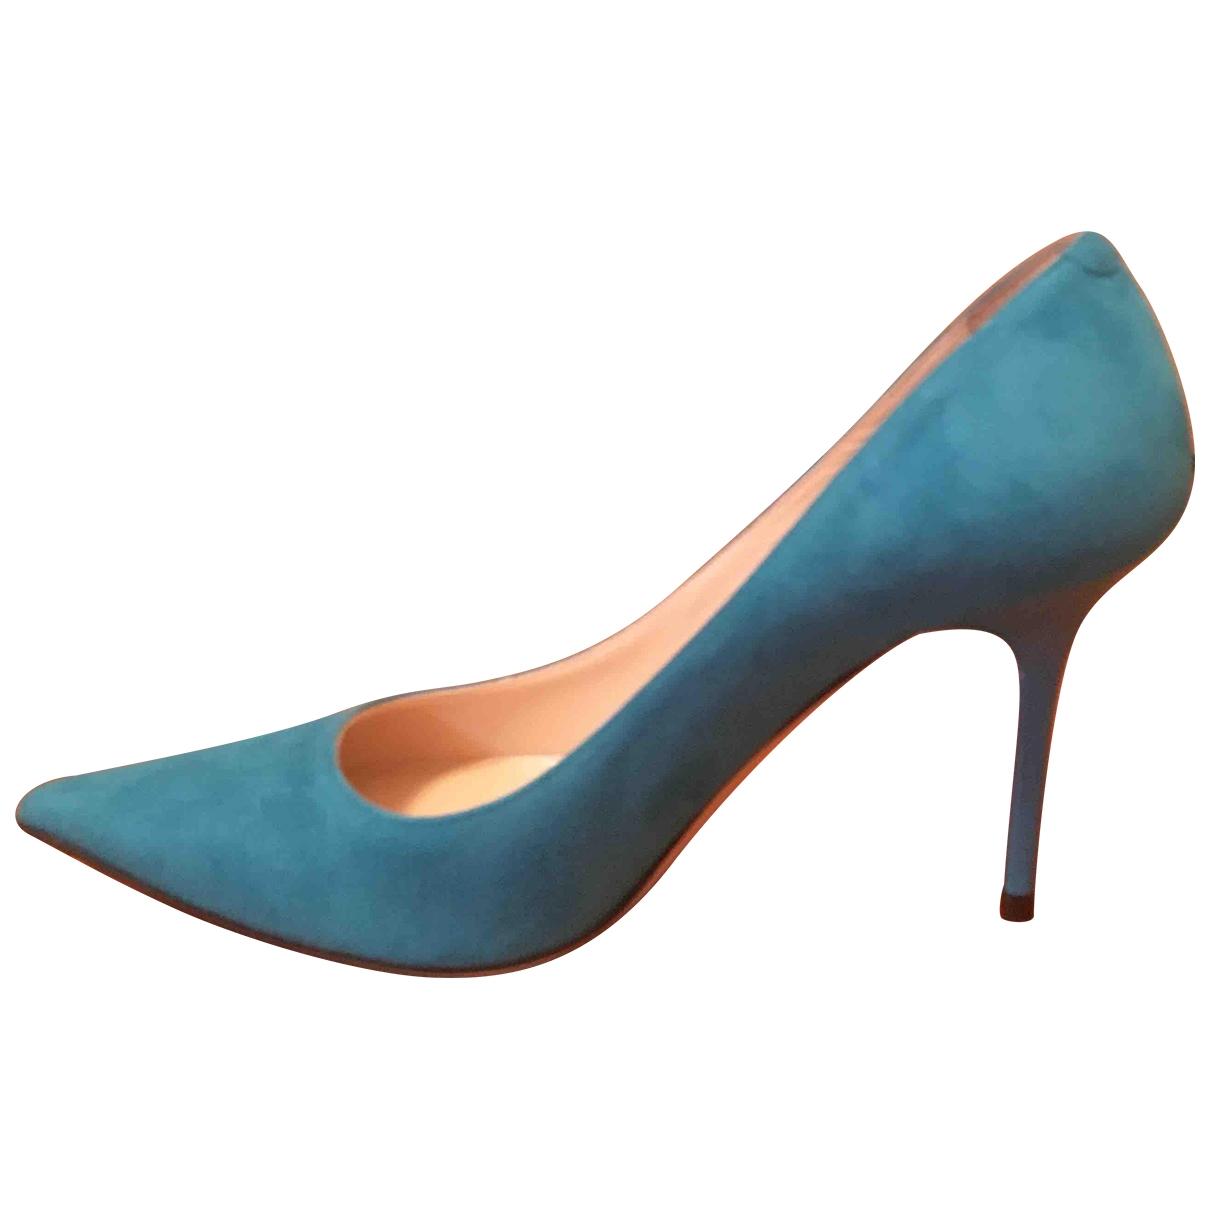 Jimmy Choo \N Turquoise Suede Heels for Women 36.5 IT